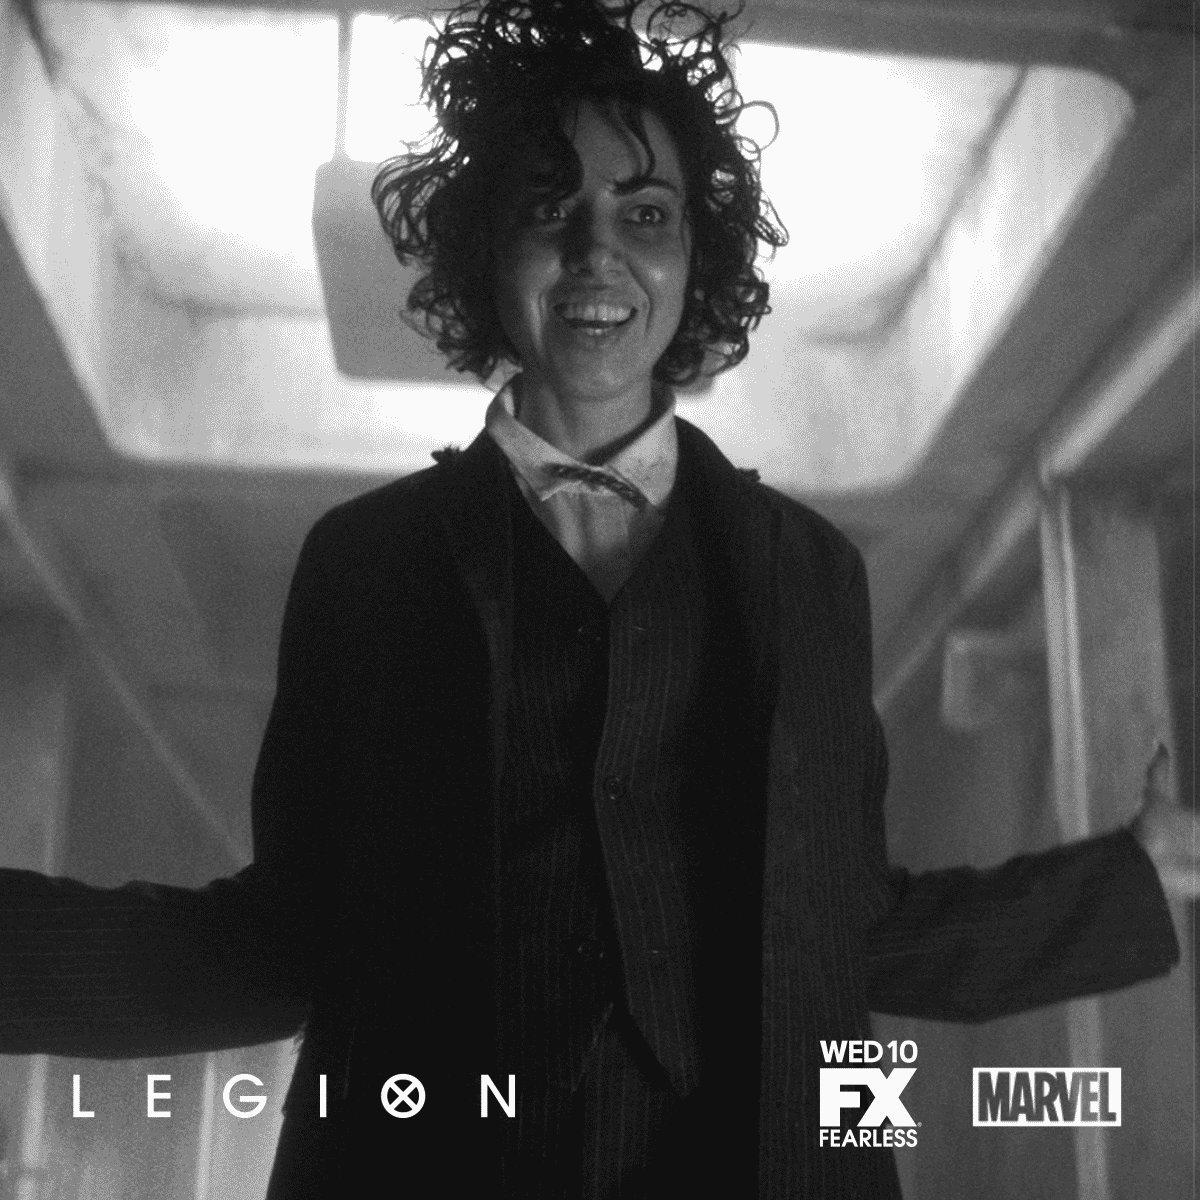 Trigger happy. #LegionFX https://t.co/AupdpIJJtx